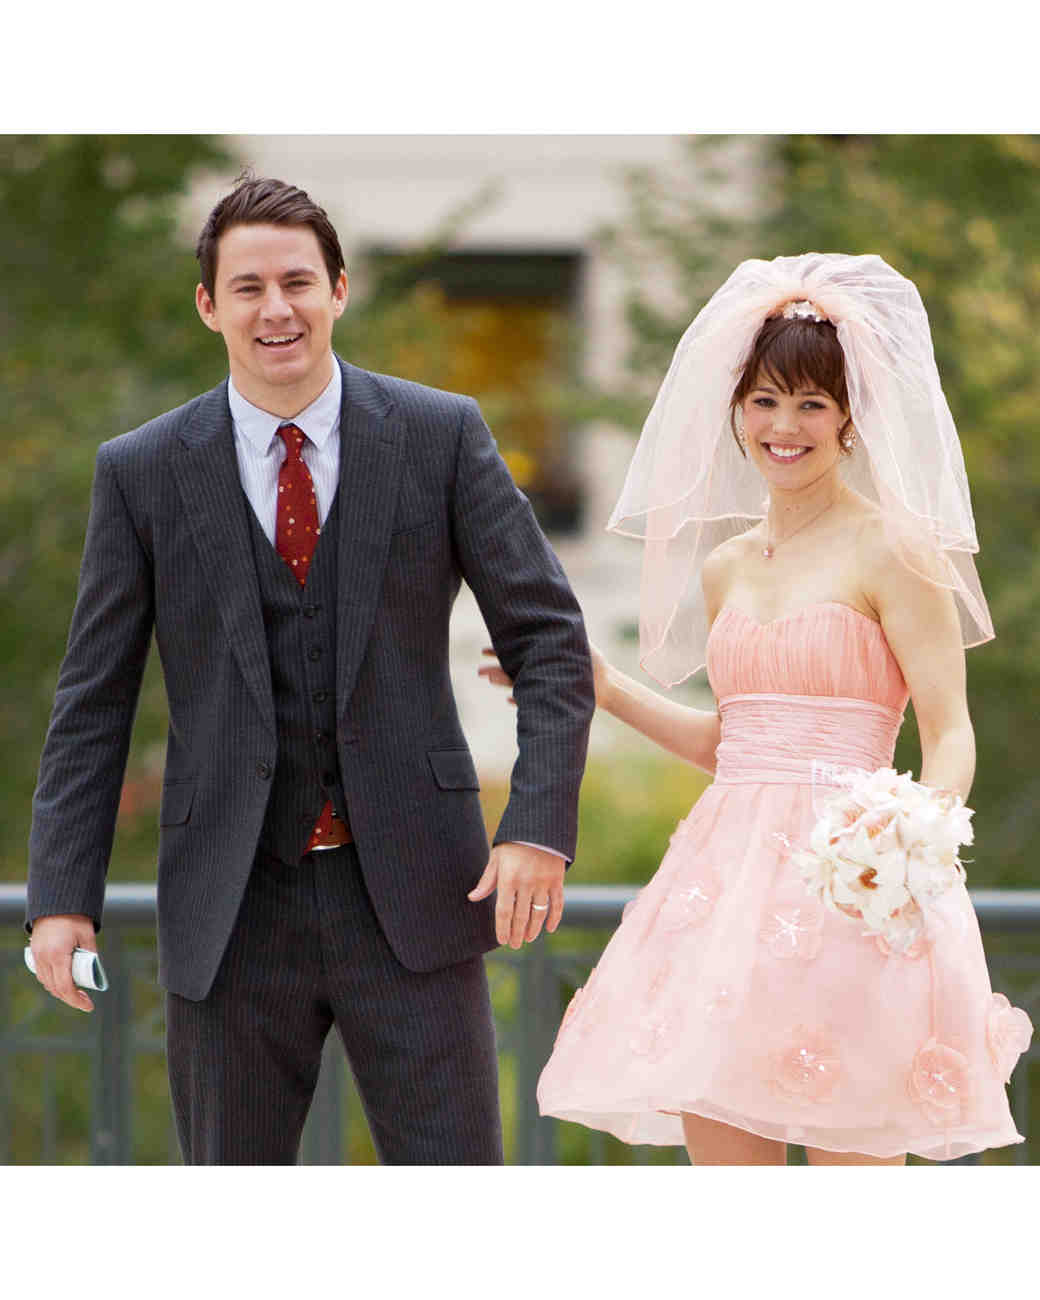 movie-wedding-dresses-the-vow-rachel-mcadams-0316.jpg